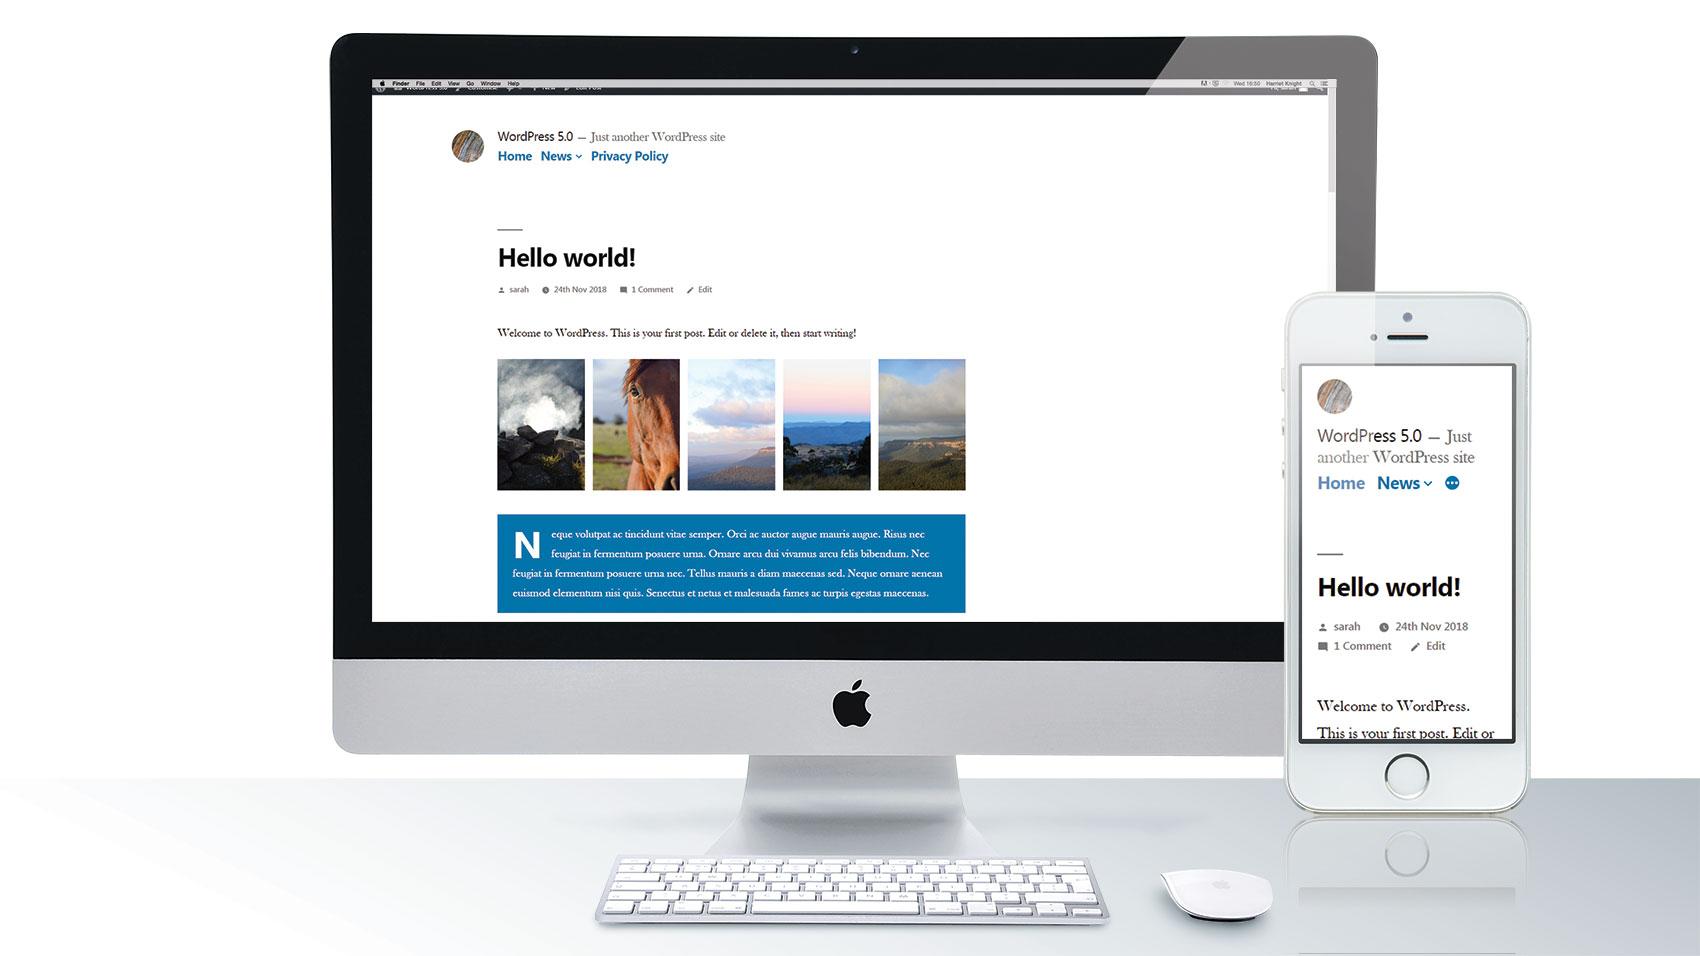 What's new in WordPress 5.0?